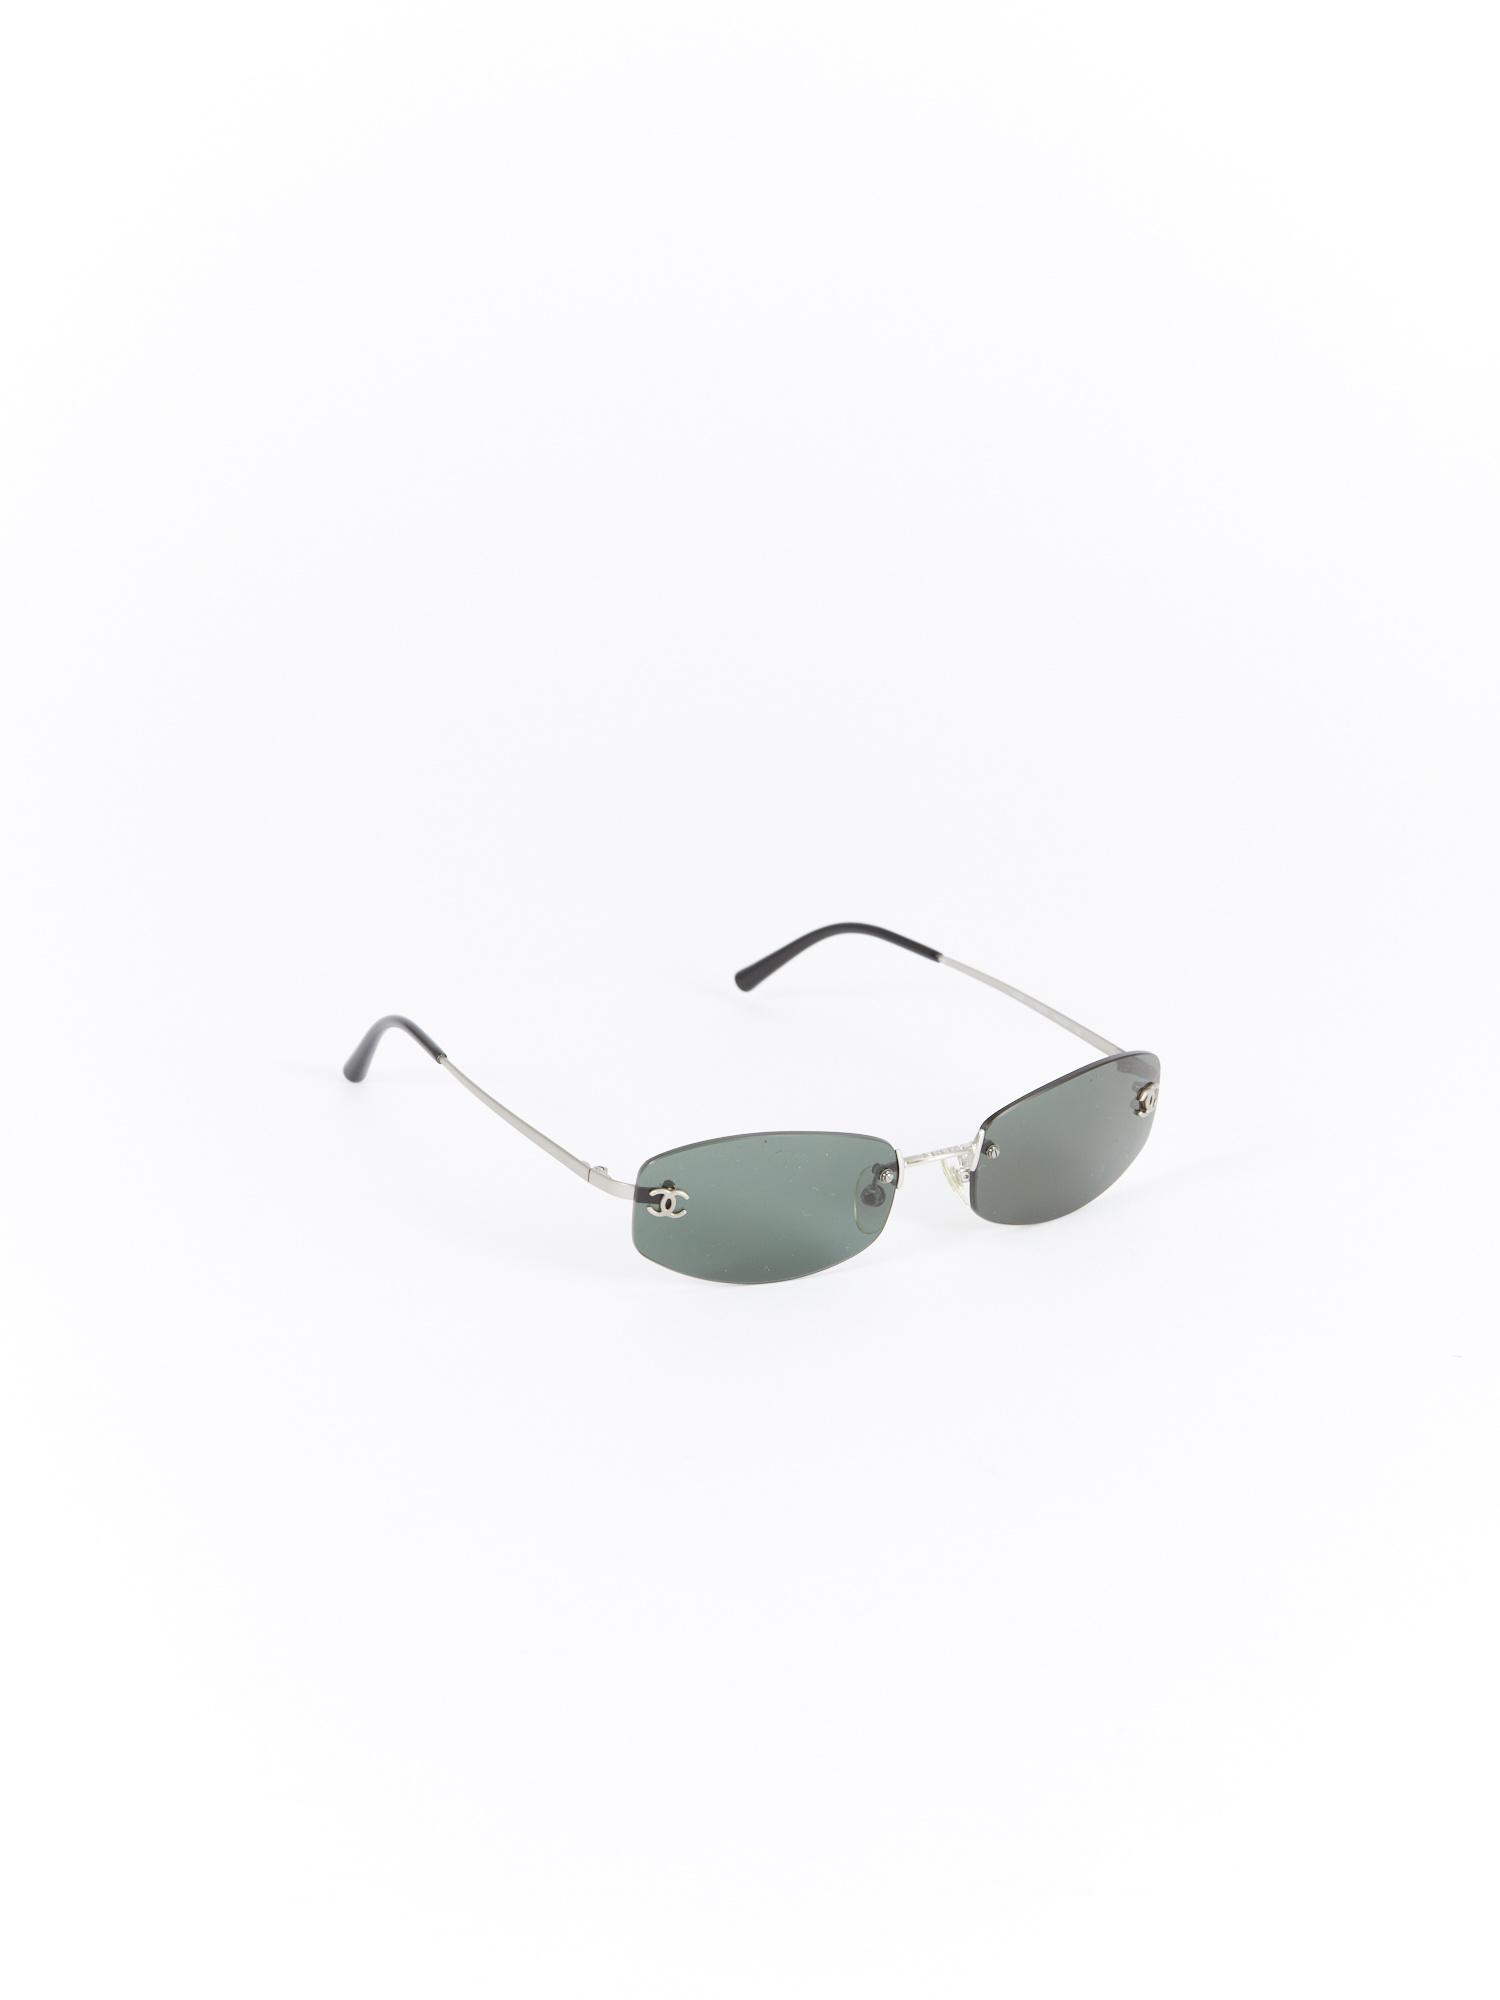 5f94e3d21daa Chanel Frameless Sunglasses | RUSE